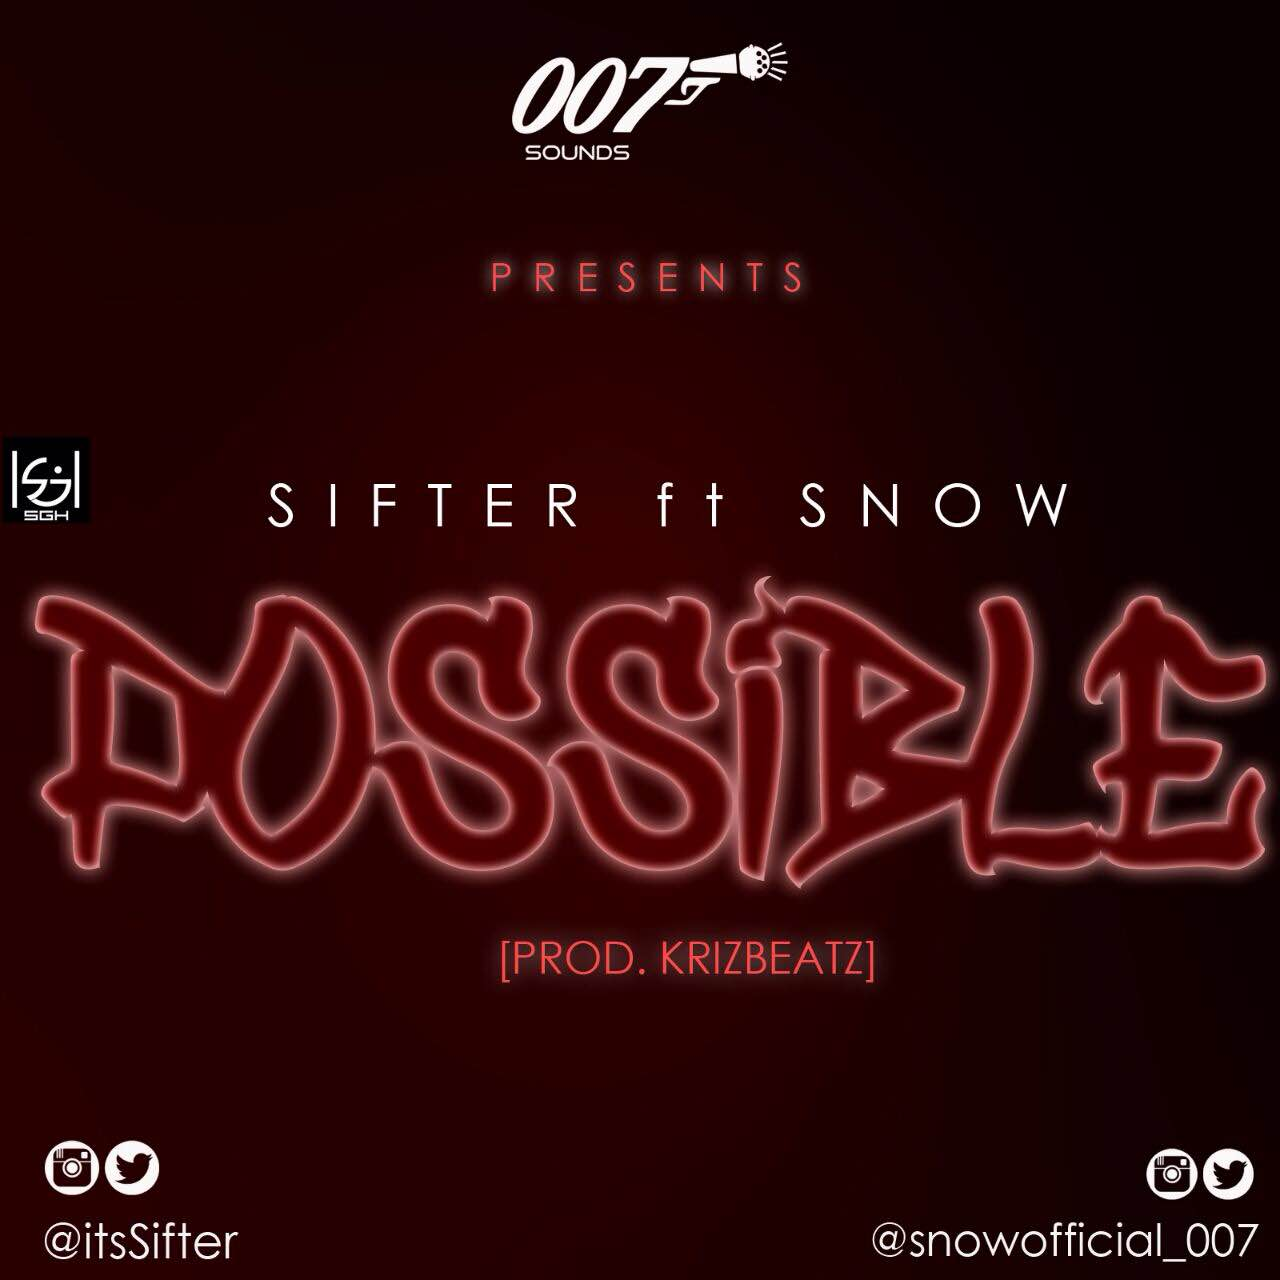 Sifter Ft. Snow – Possible (Prod. Krizbeatz)